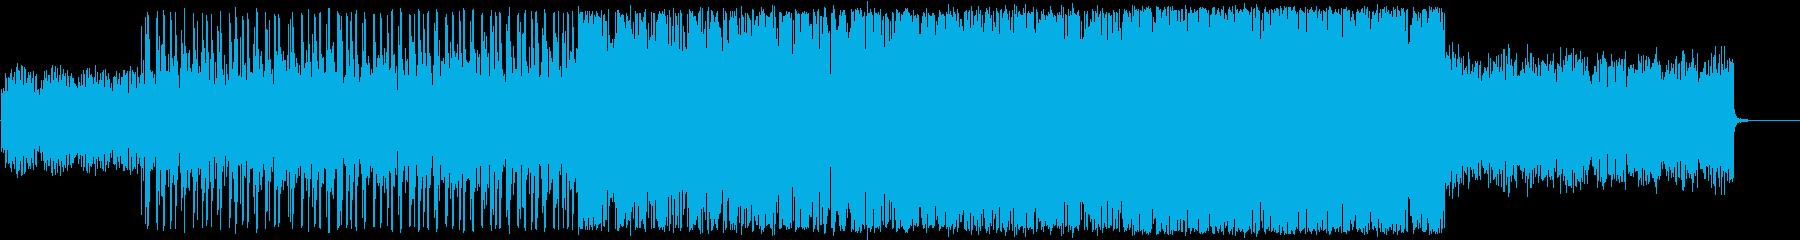 SF/タイトで速いビートのテクスチャーの再生済みの波形